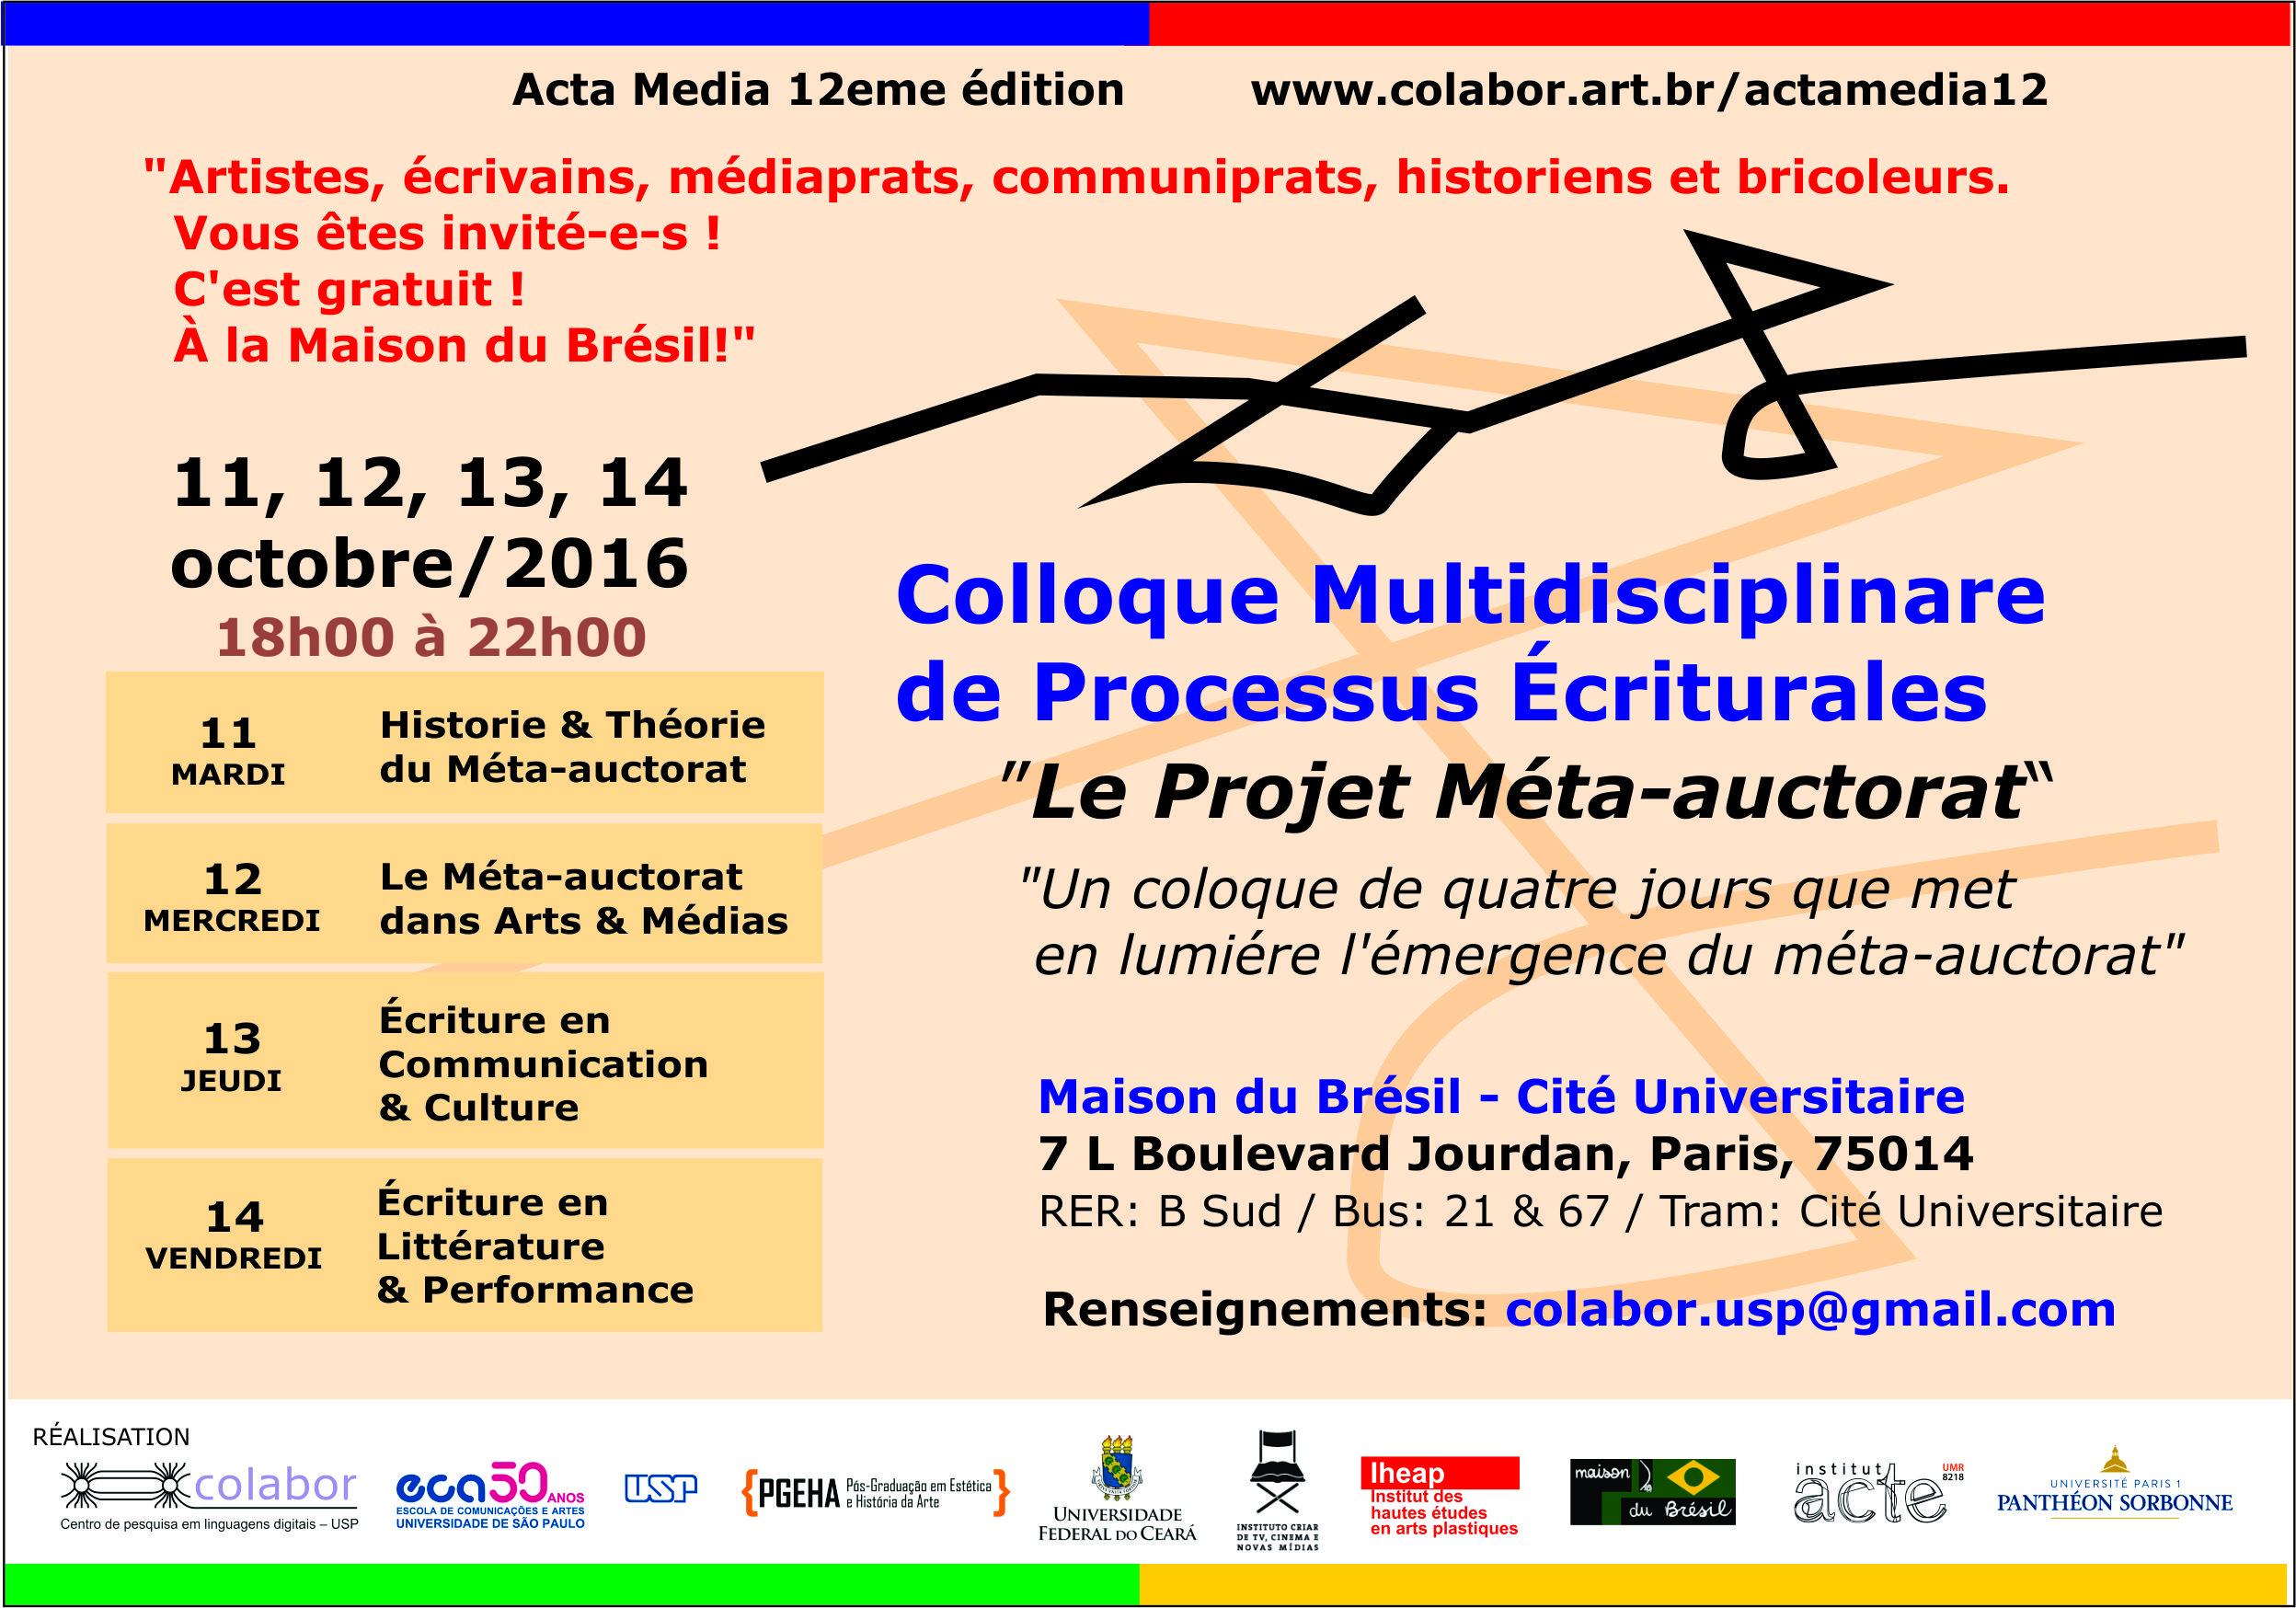 actamedia12-frances-folheto-2-copy